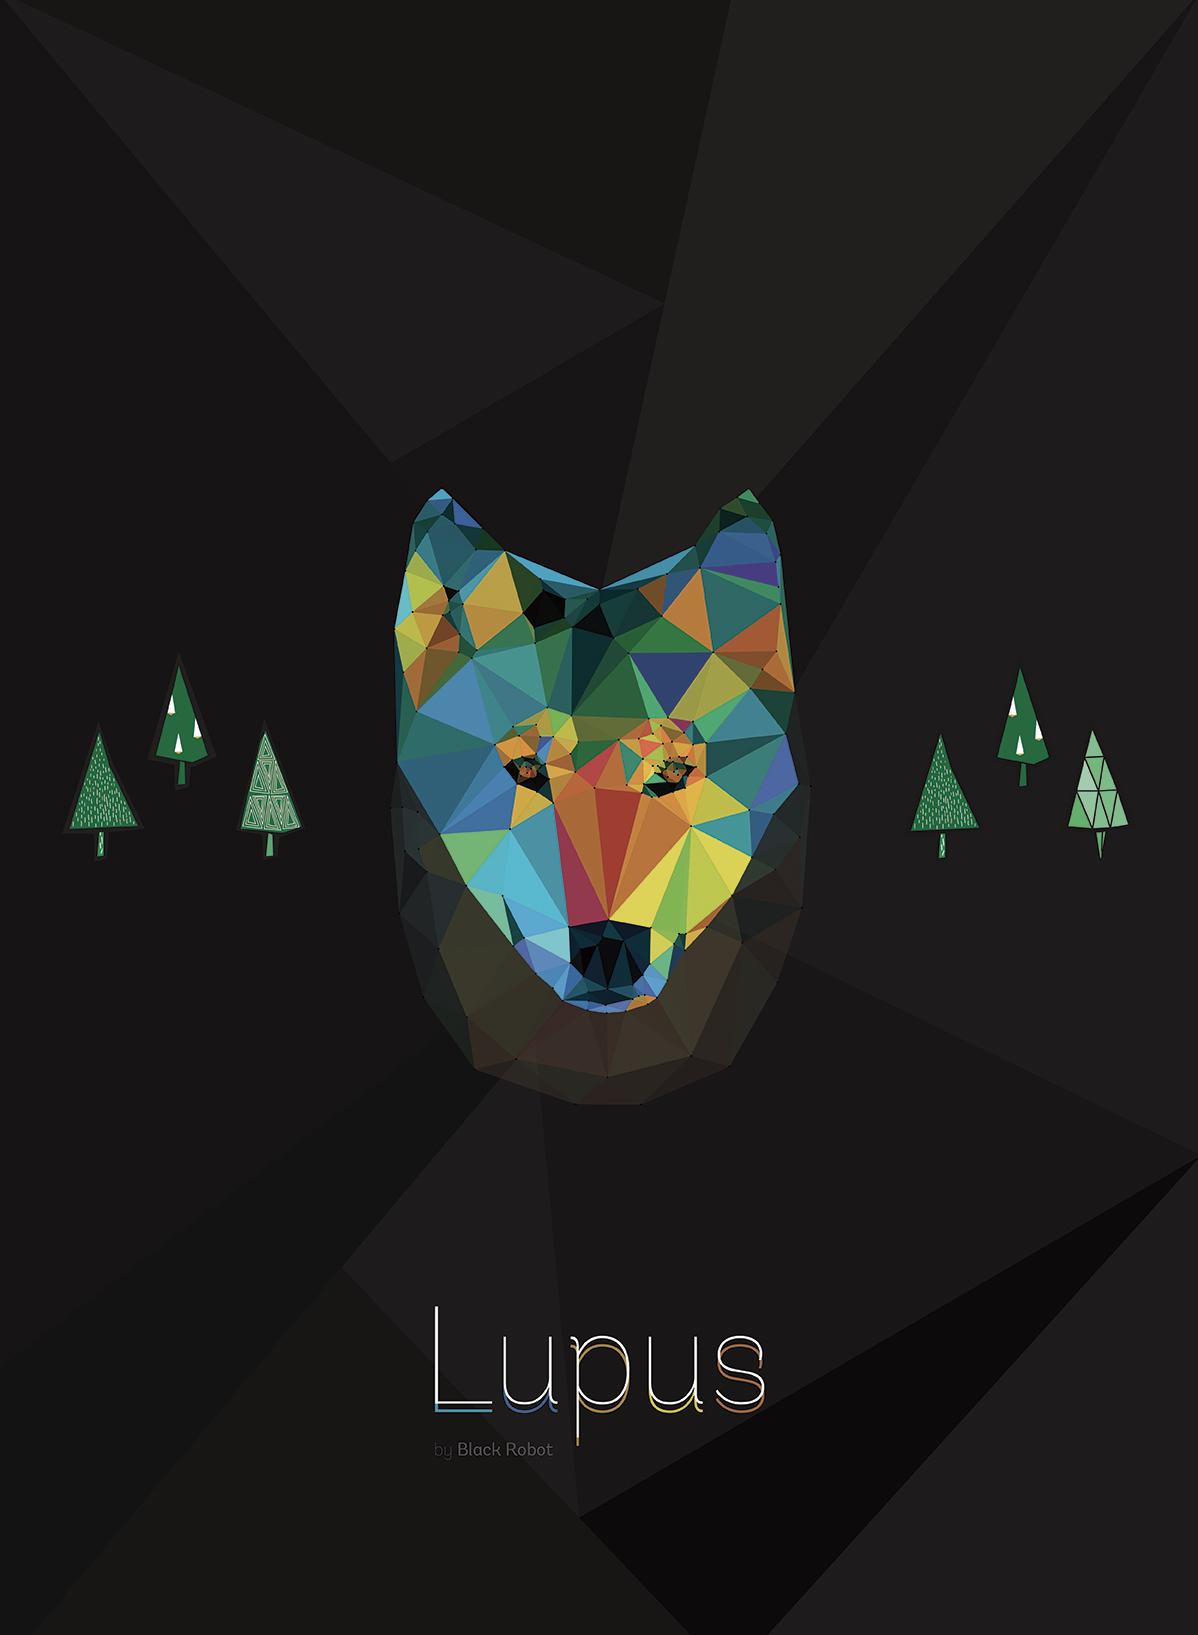 LUPUS_Affiche_02_web.jpg